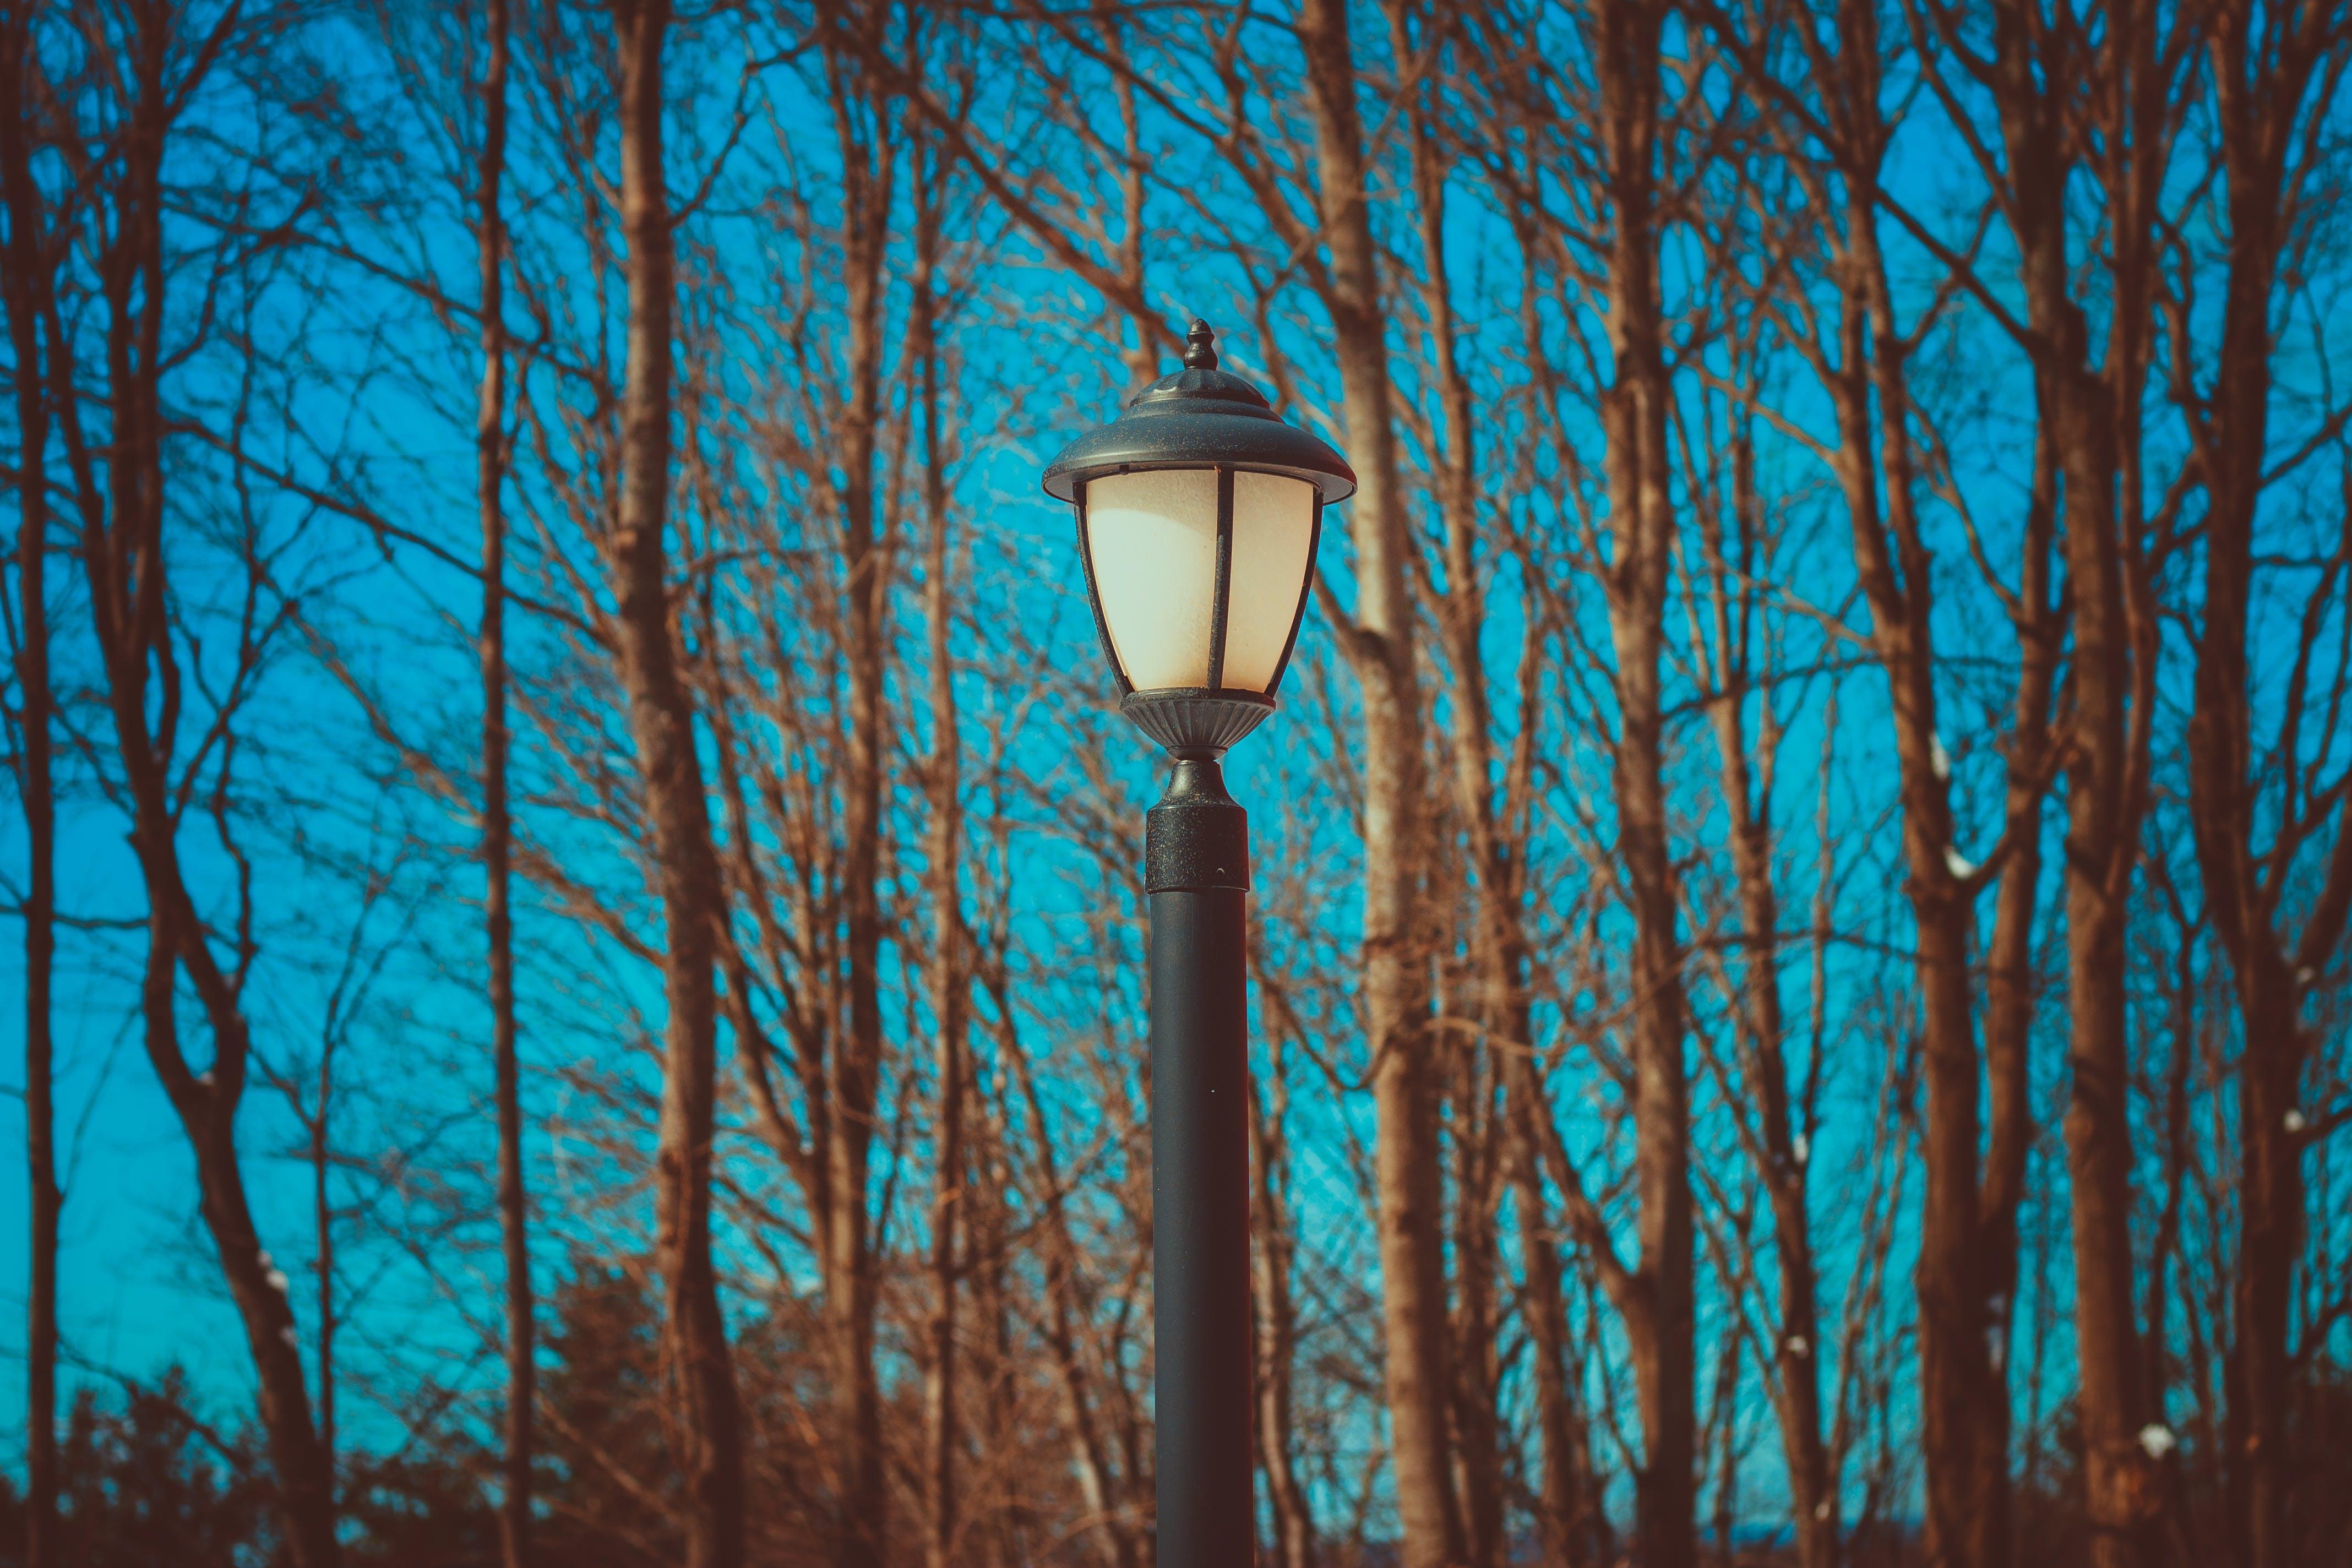 Kostenloses Stock Foto zu äste, bäume, holz, landschaft